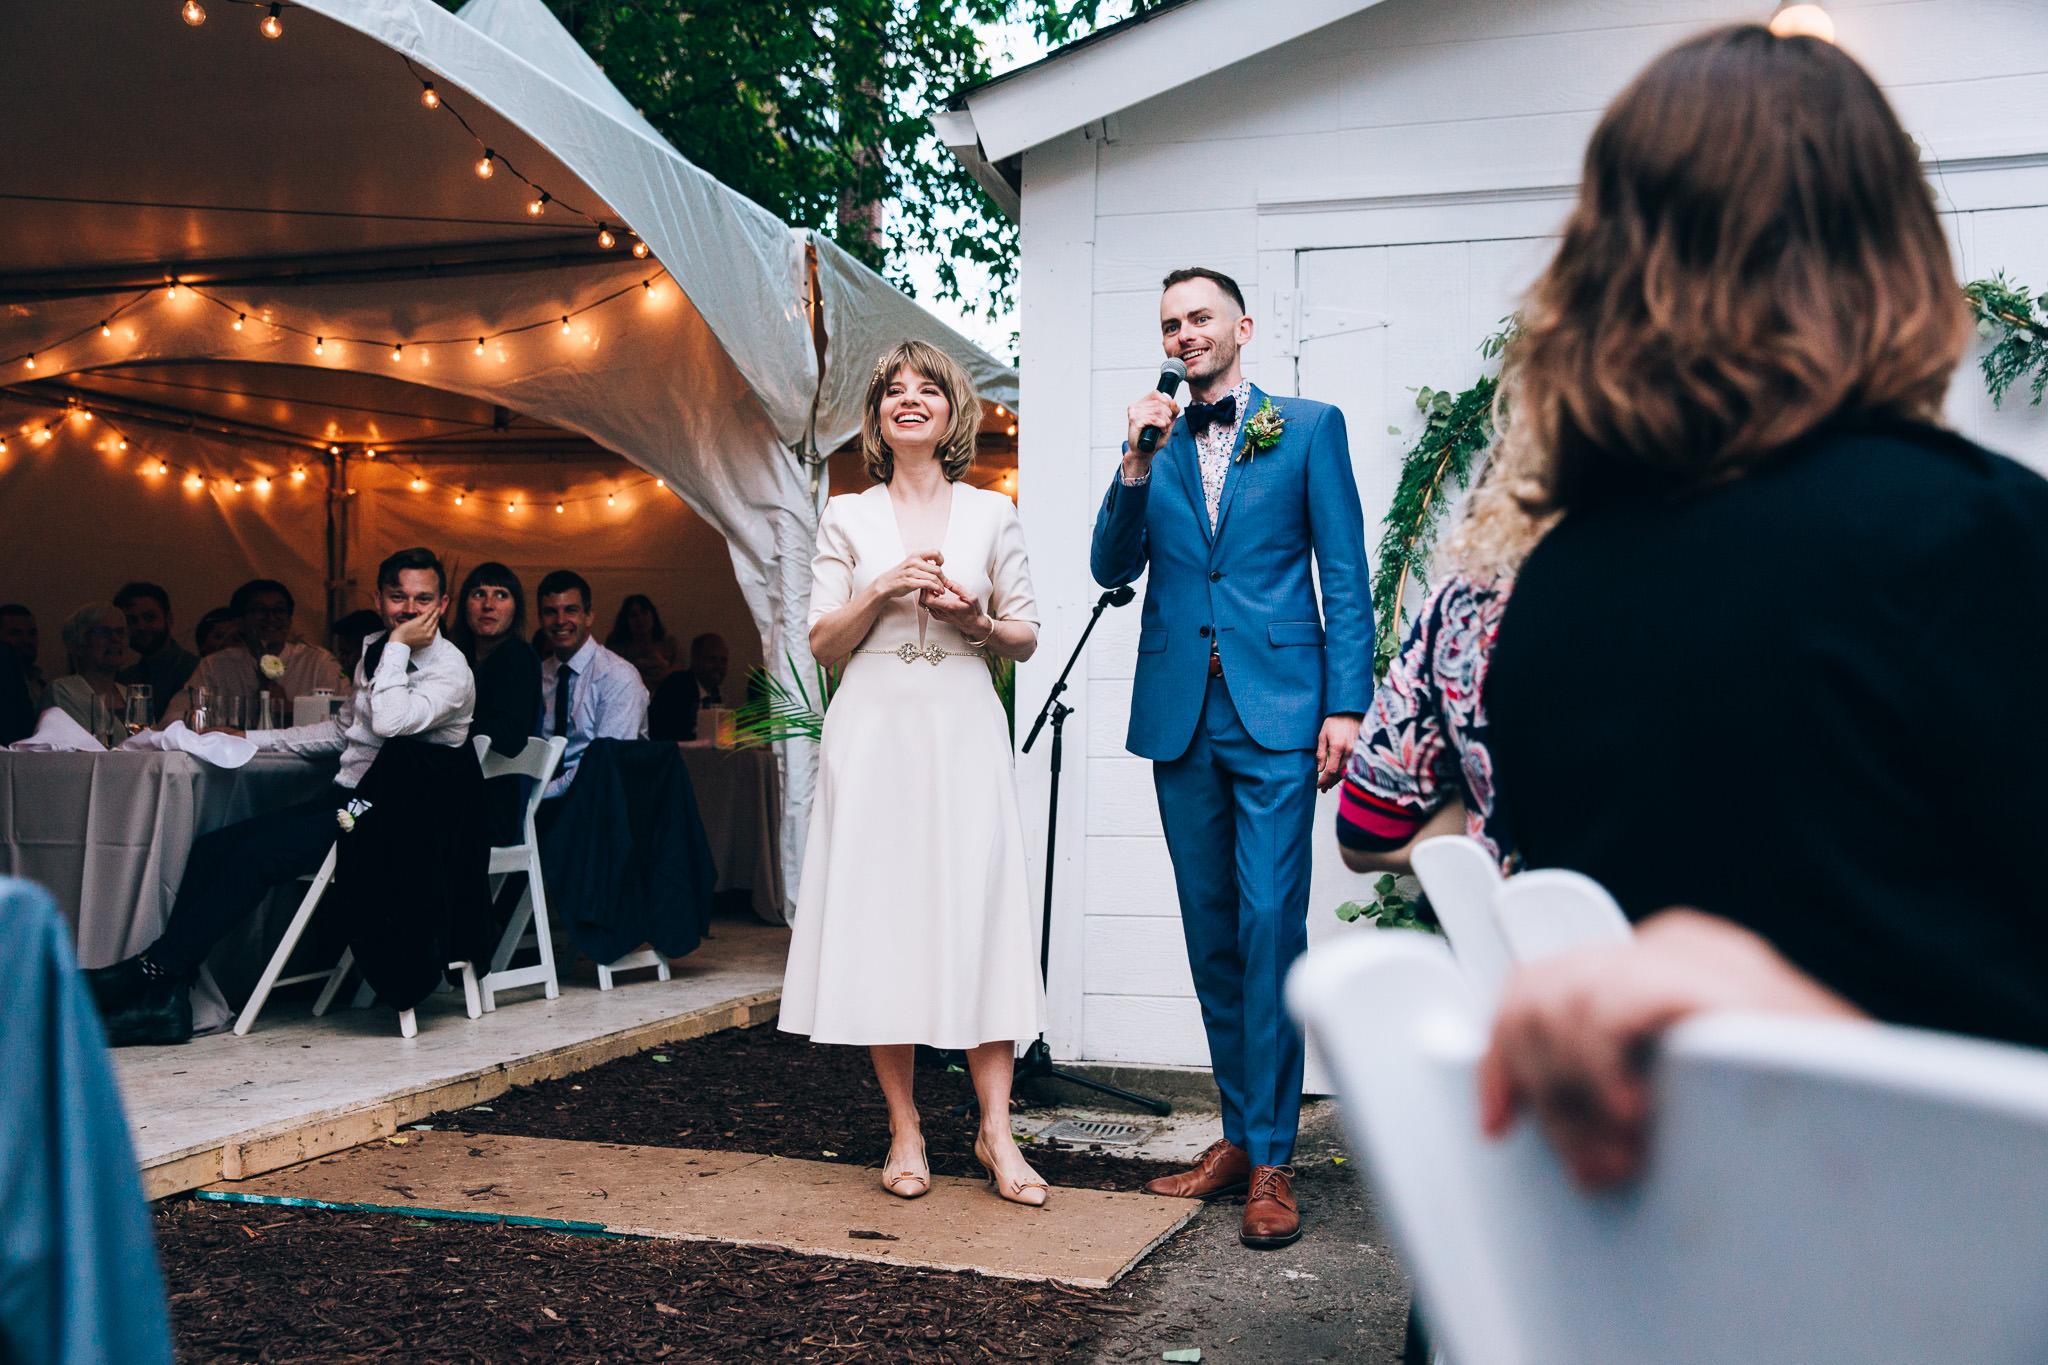 073_Canada-documentary-wedding-photograp